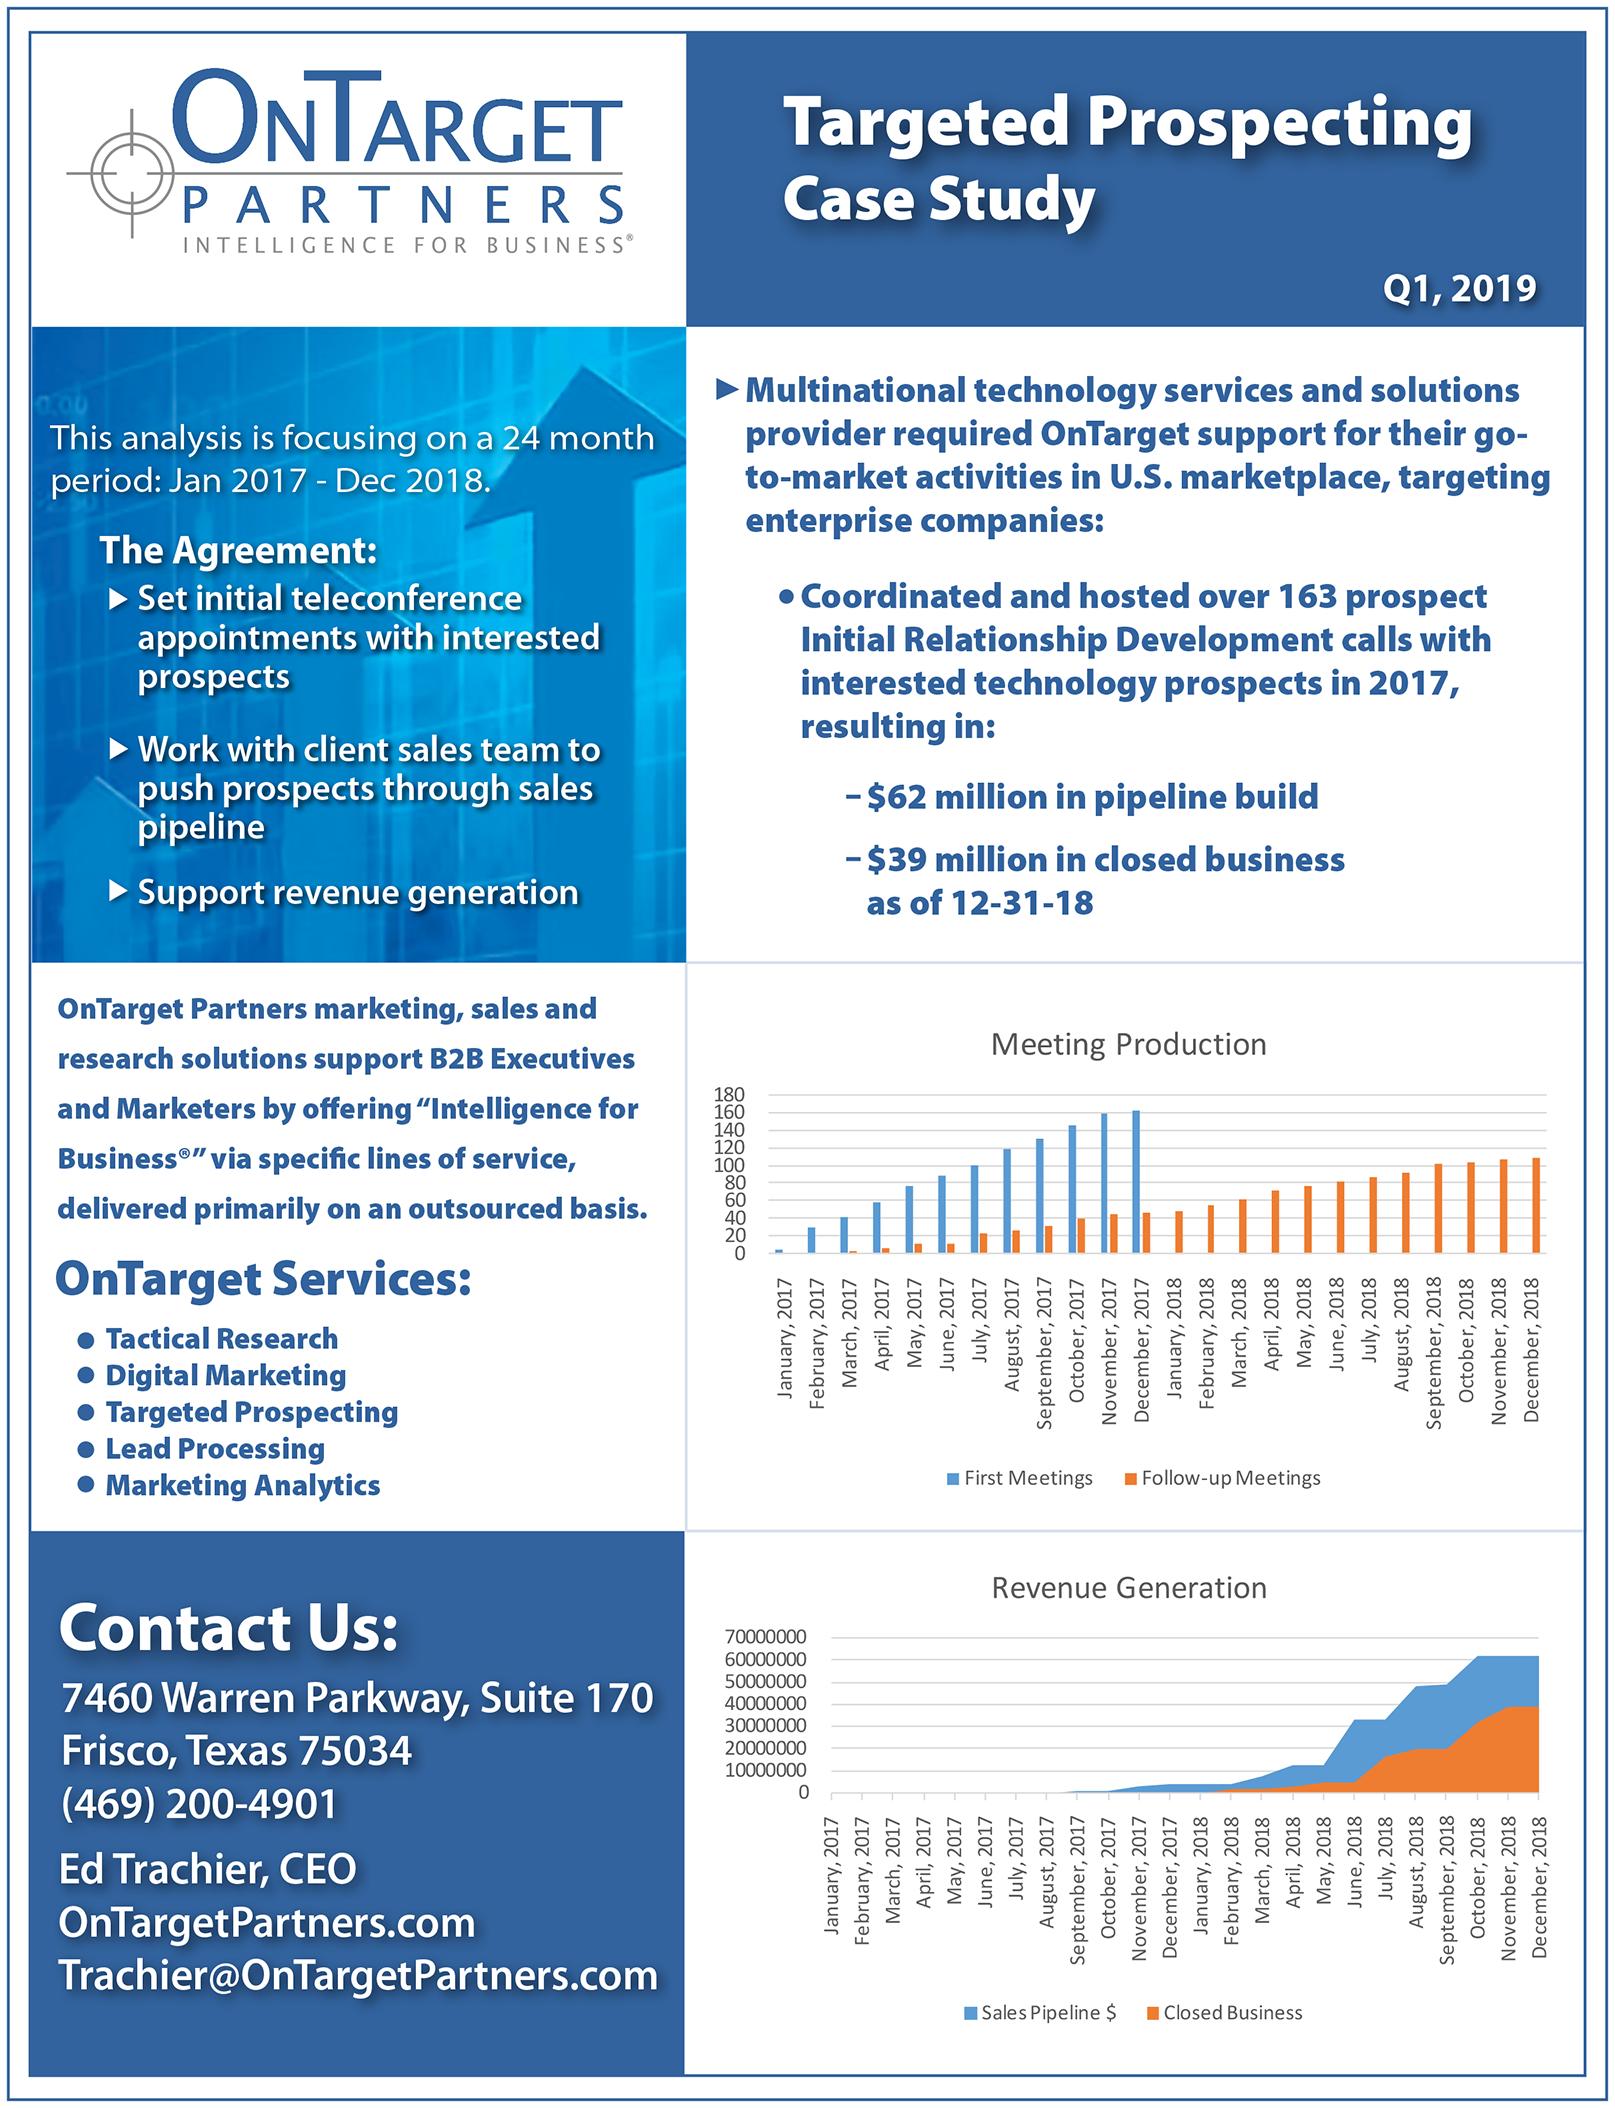 OnTargetTargetedProspectingMultinationalTechnologyServicesCaseStudy01-2019